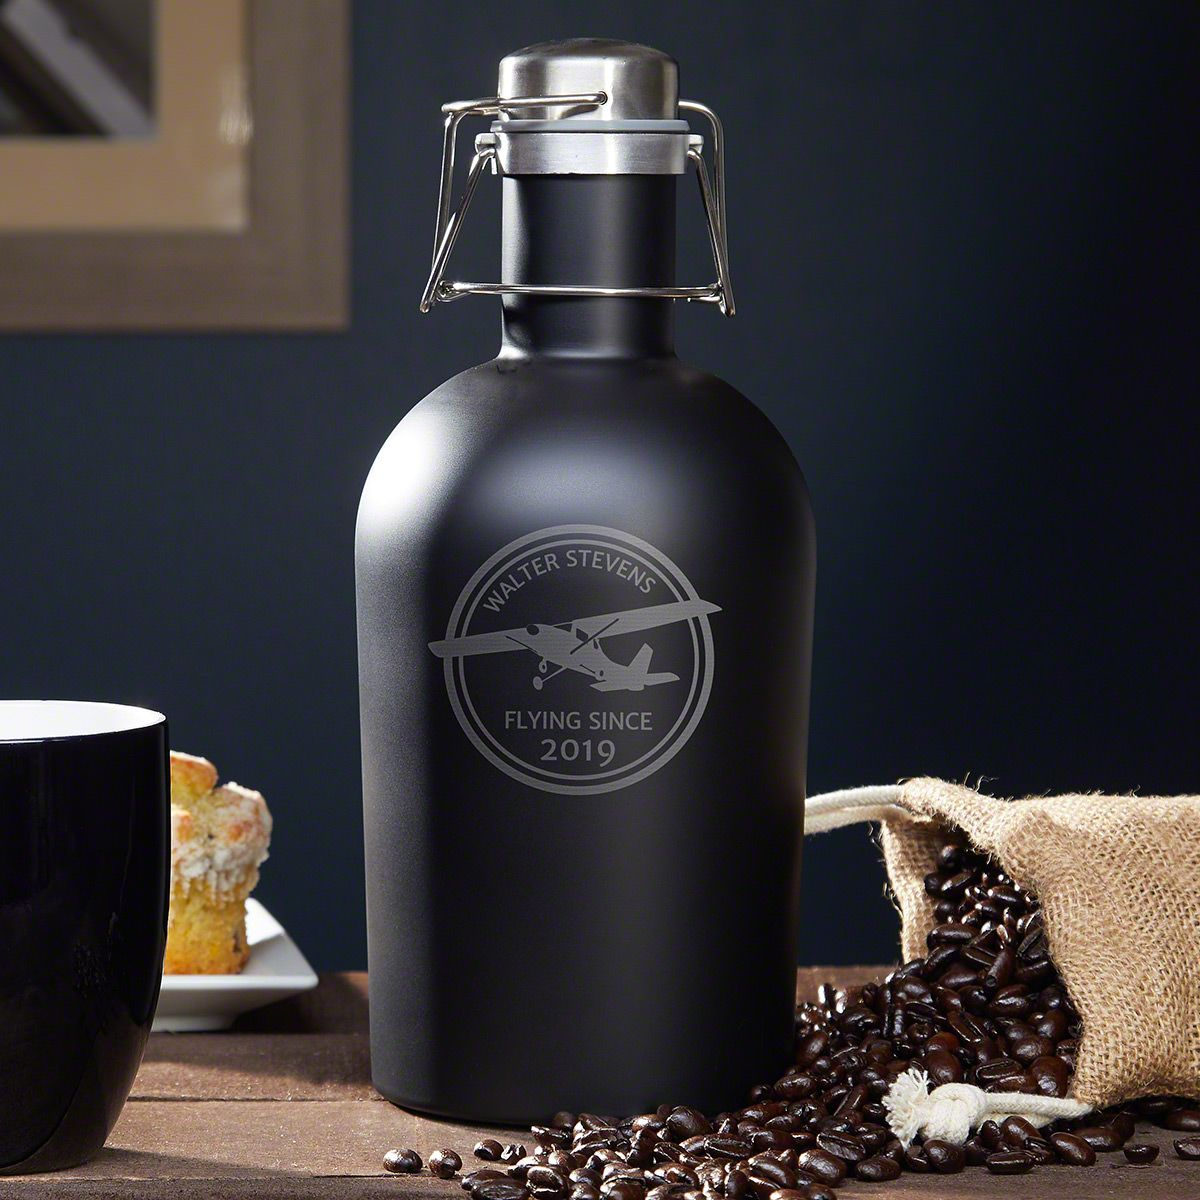 Aviator Custom Stainless Steel Coffee Carafe - Gift for Pilots